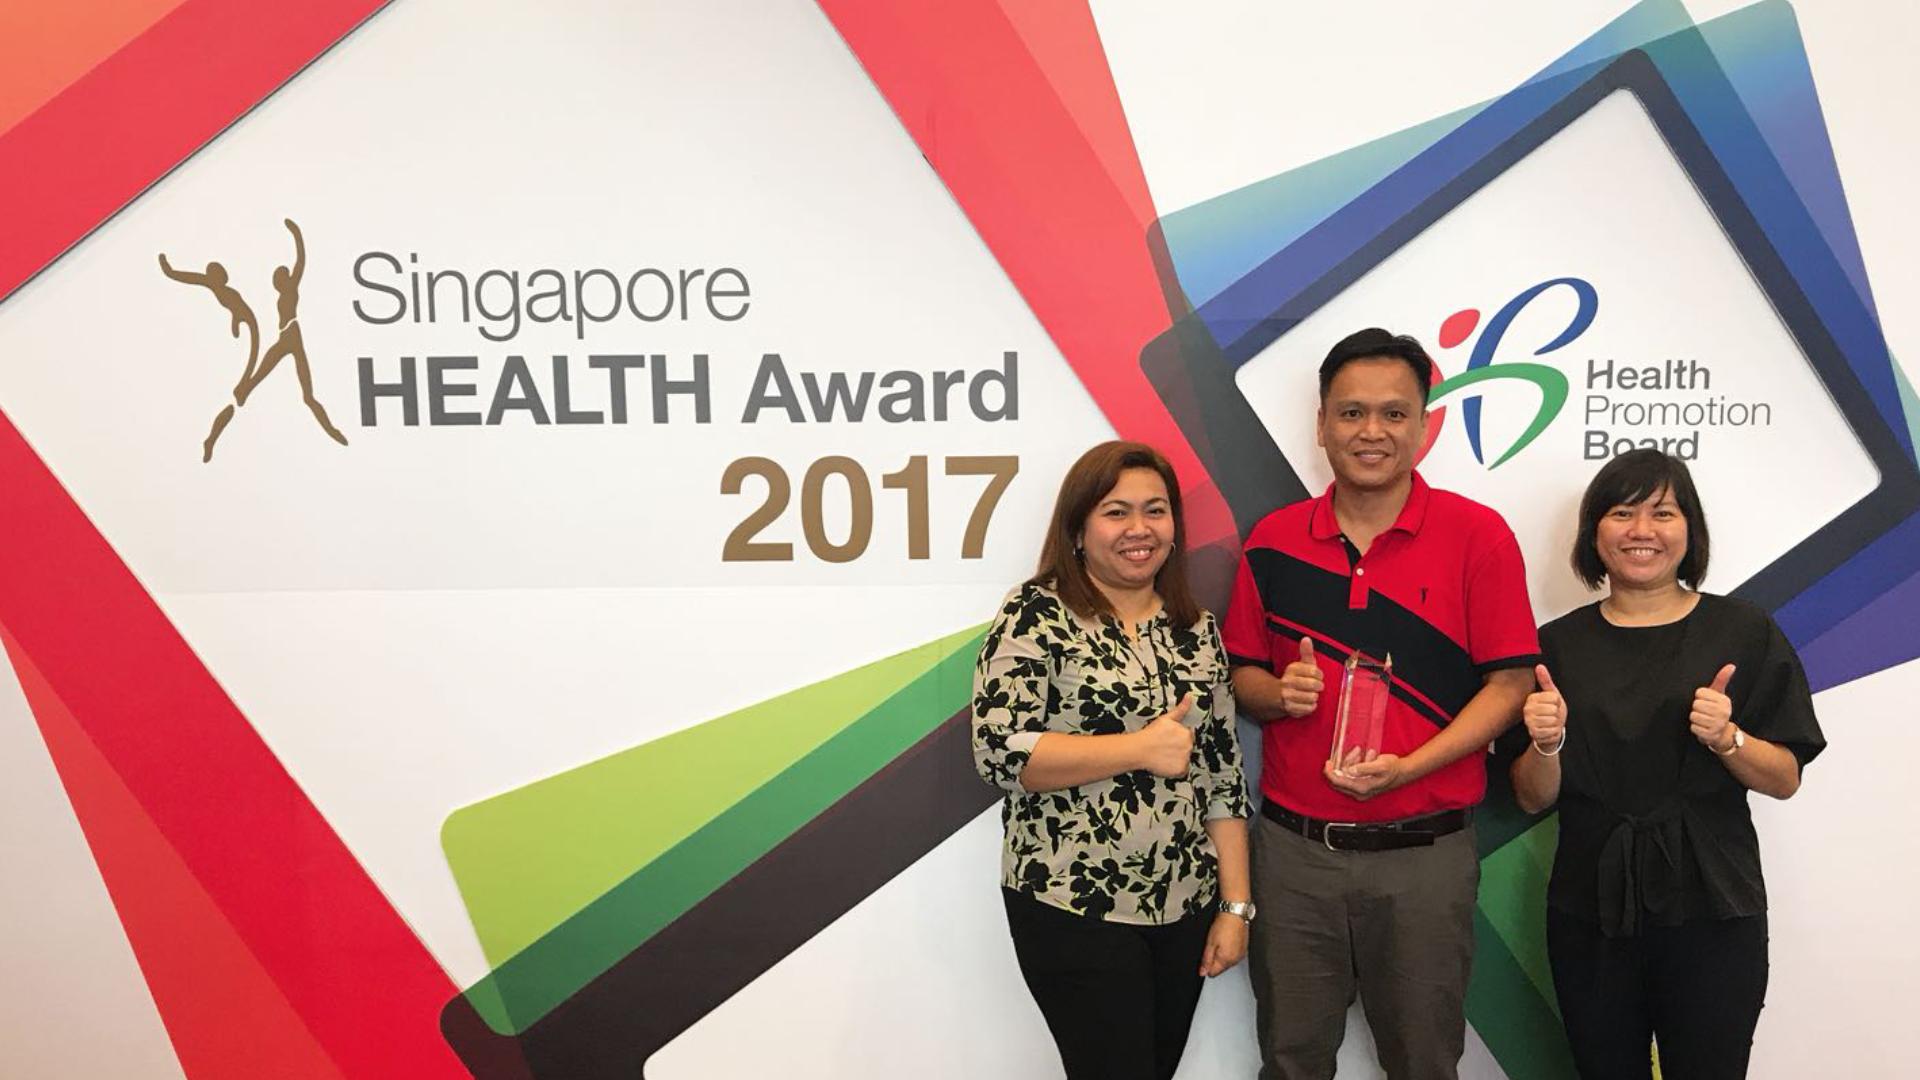 General Filter Pte Ltd Duplex Fuel Mann Hummel Health Promotion Award 2017